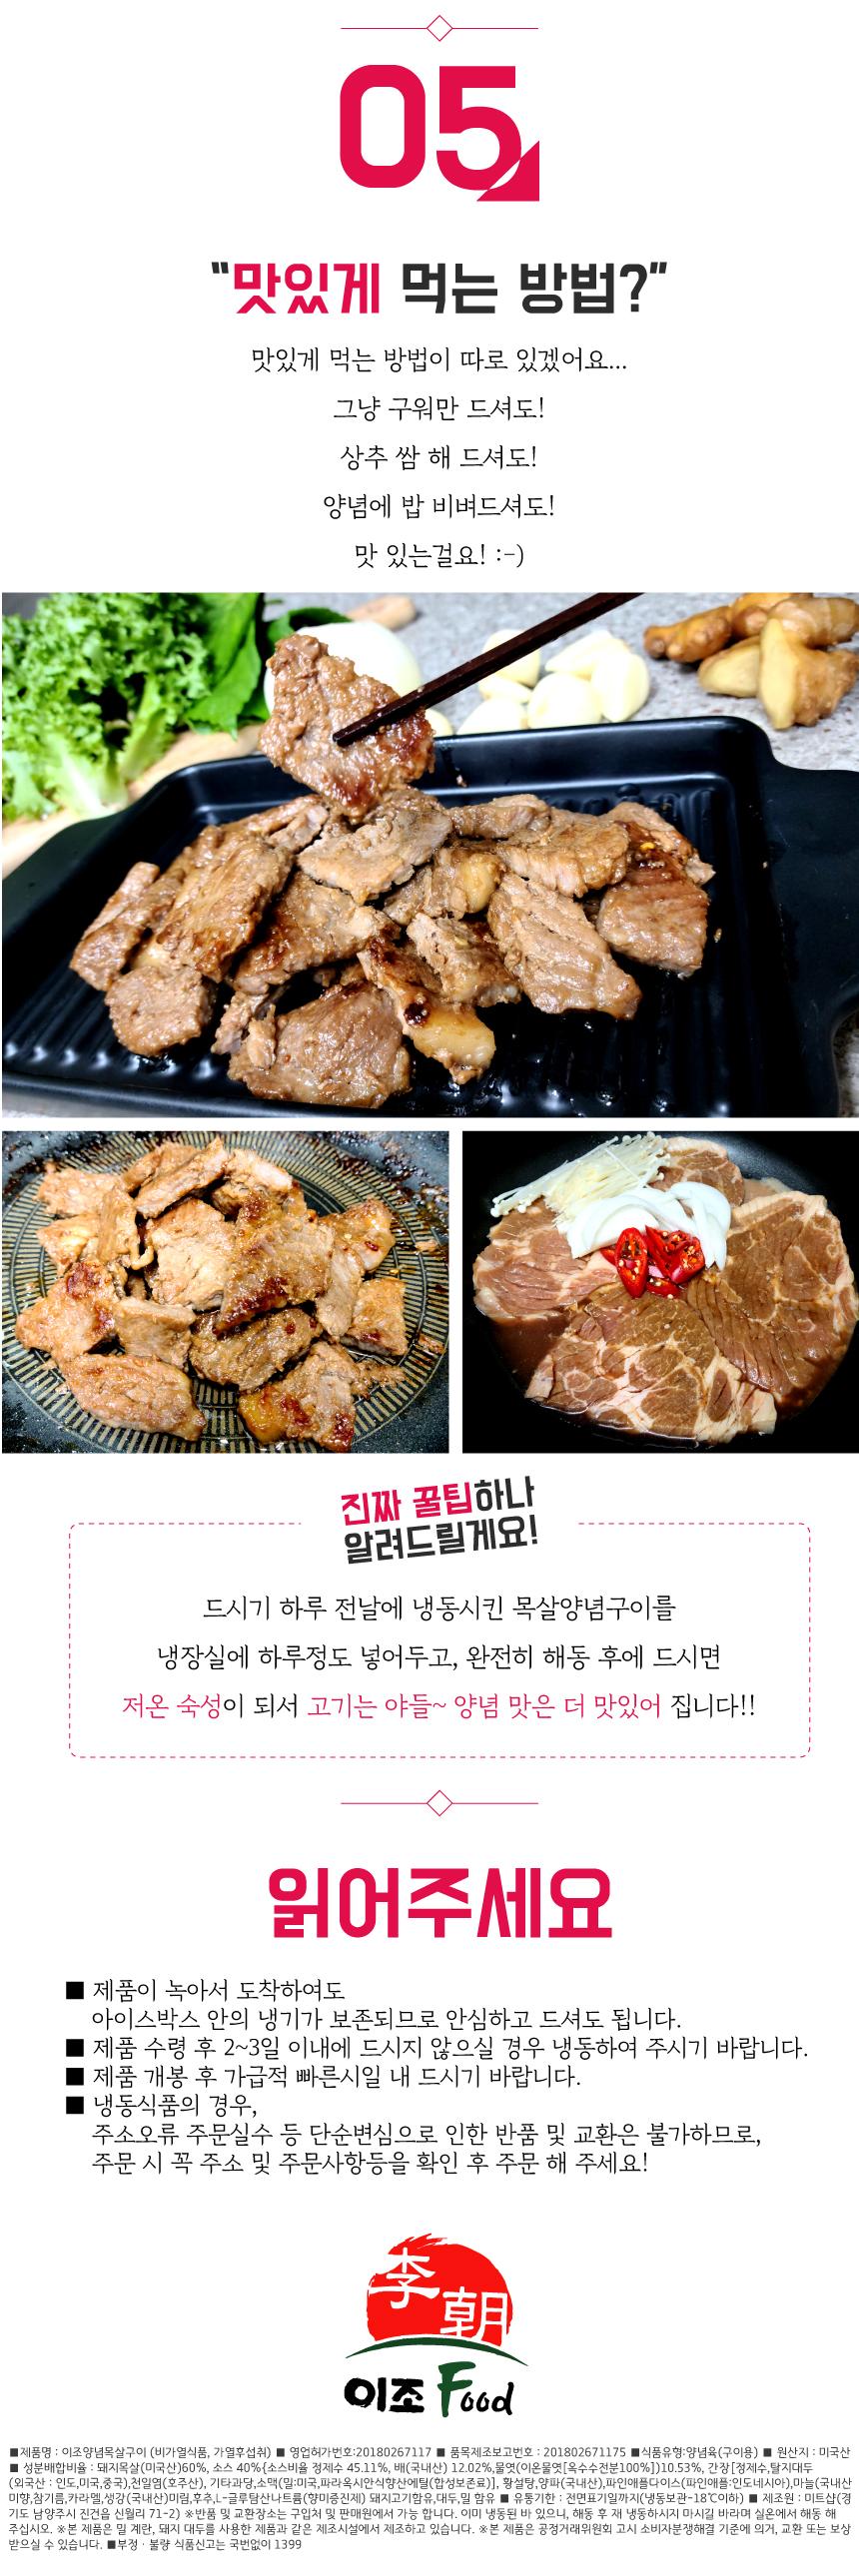 pork-300_600g-5.jpg